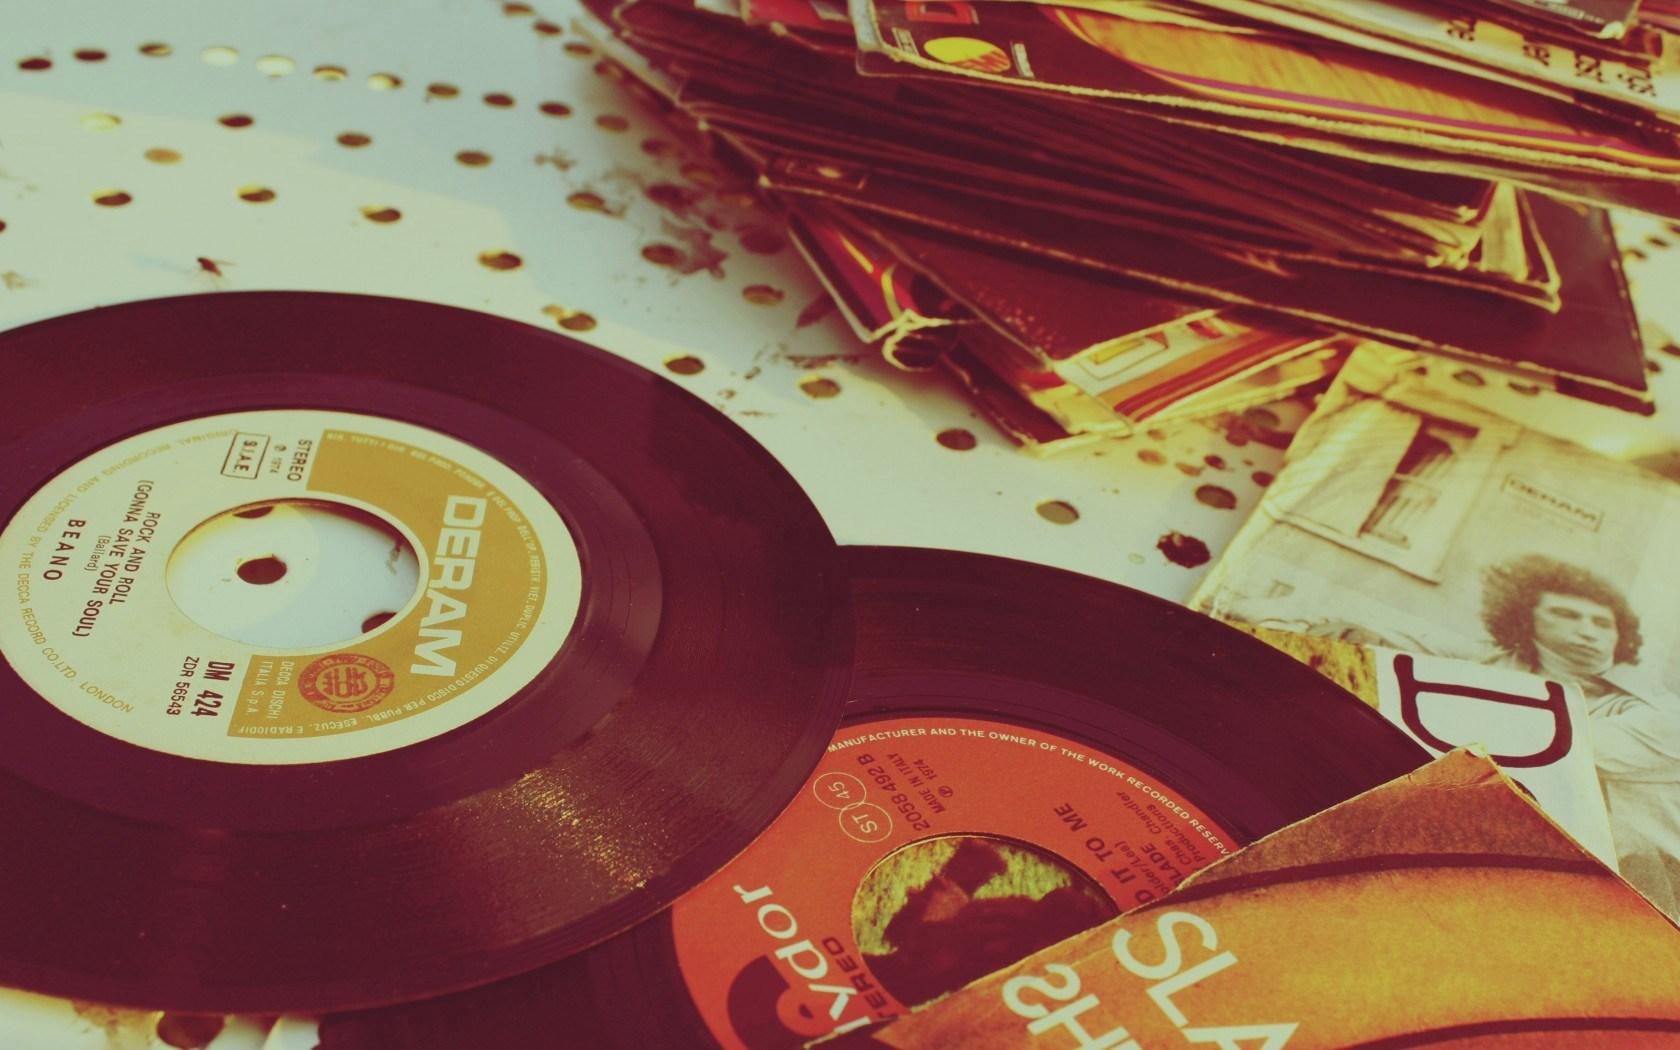 CD classic dream hd wallpaper photovintage record vinyl The 1680x1050